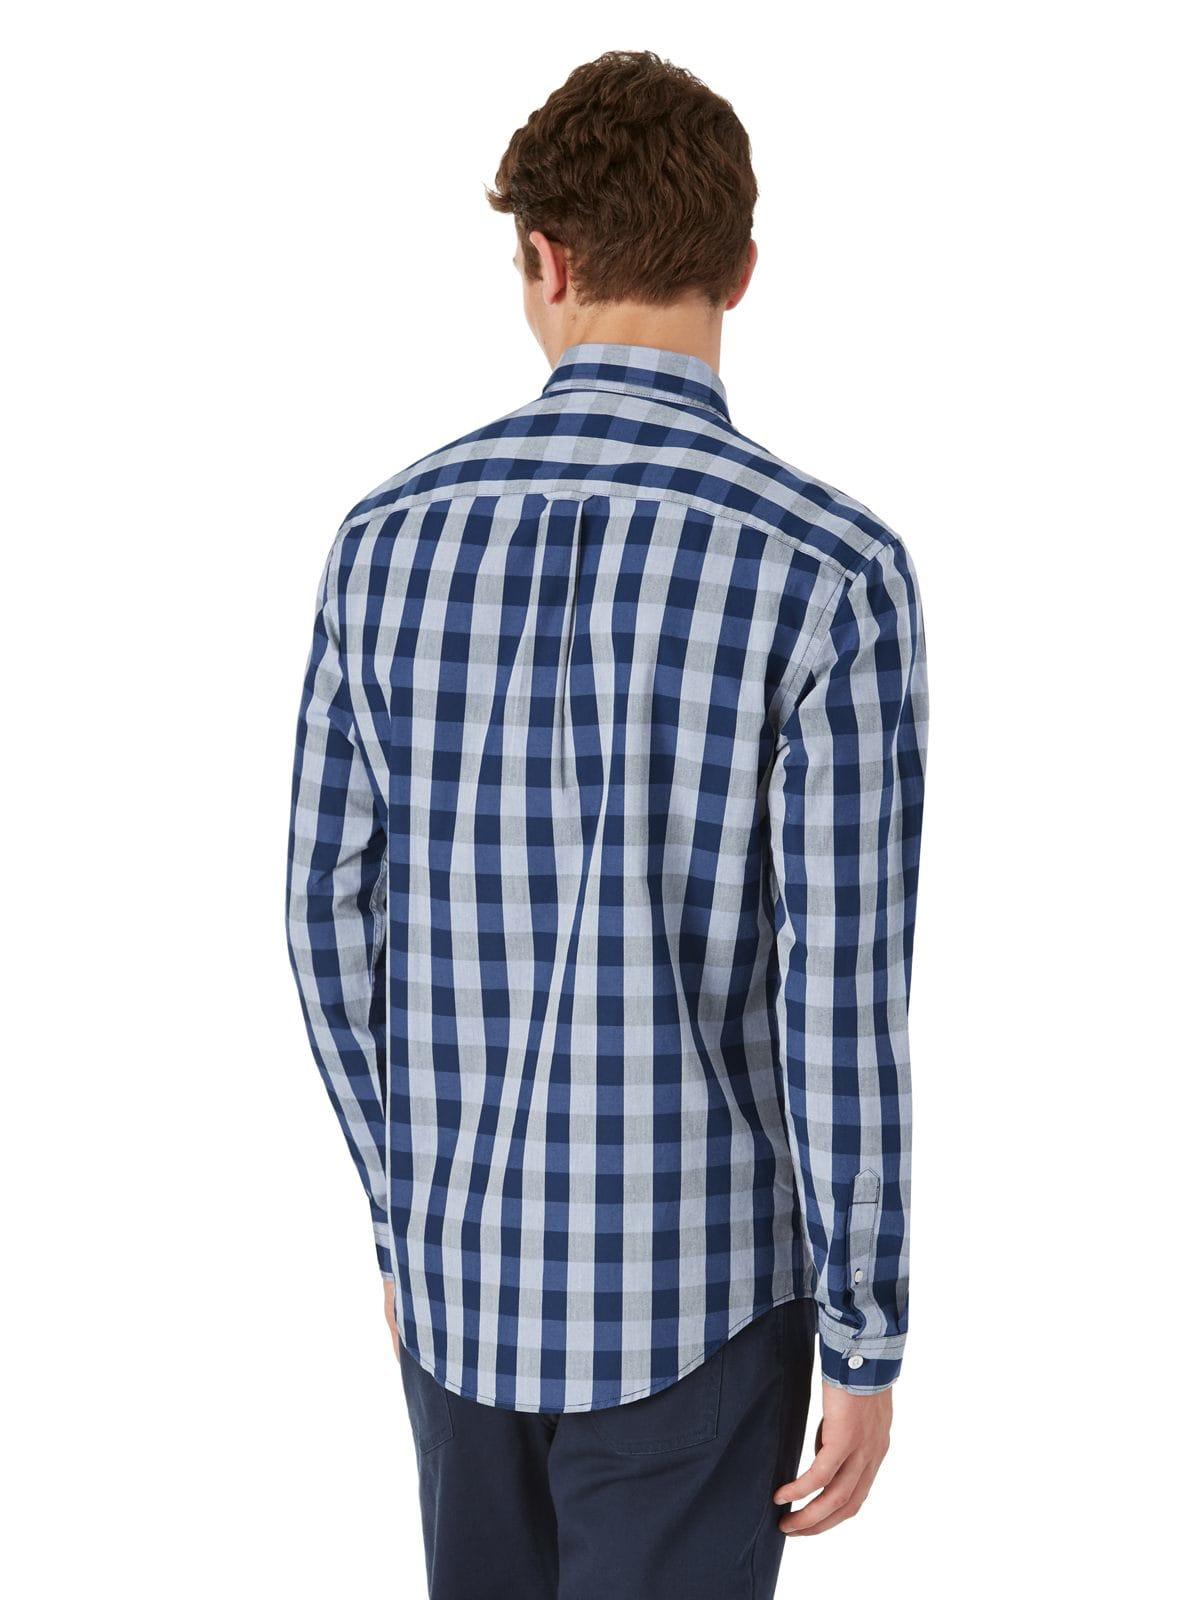 Lyst frank oak medium gingham shirt in blue in blue for Frank and oak shirt